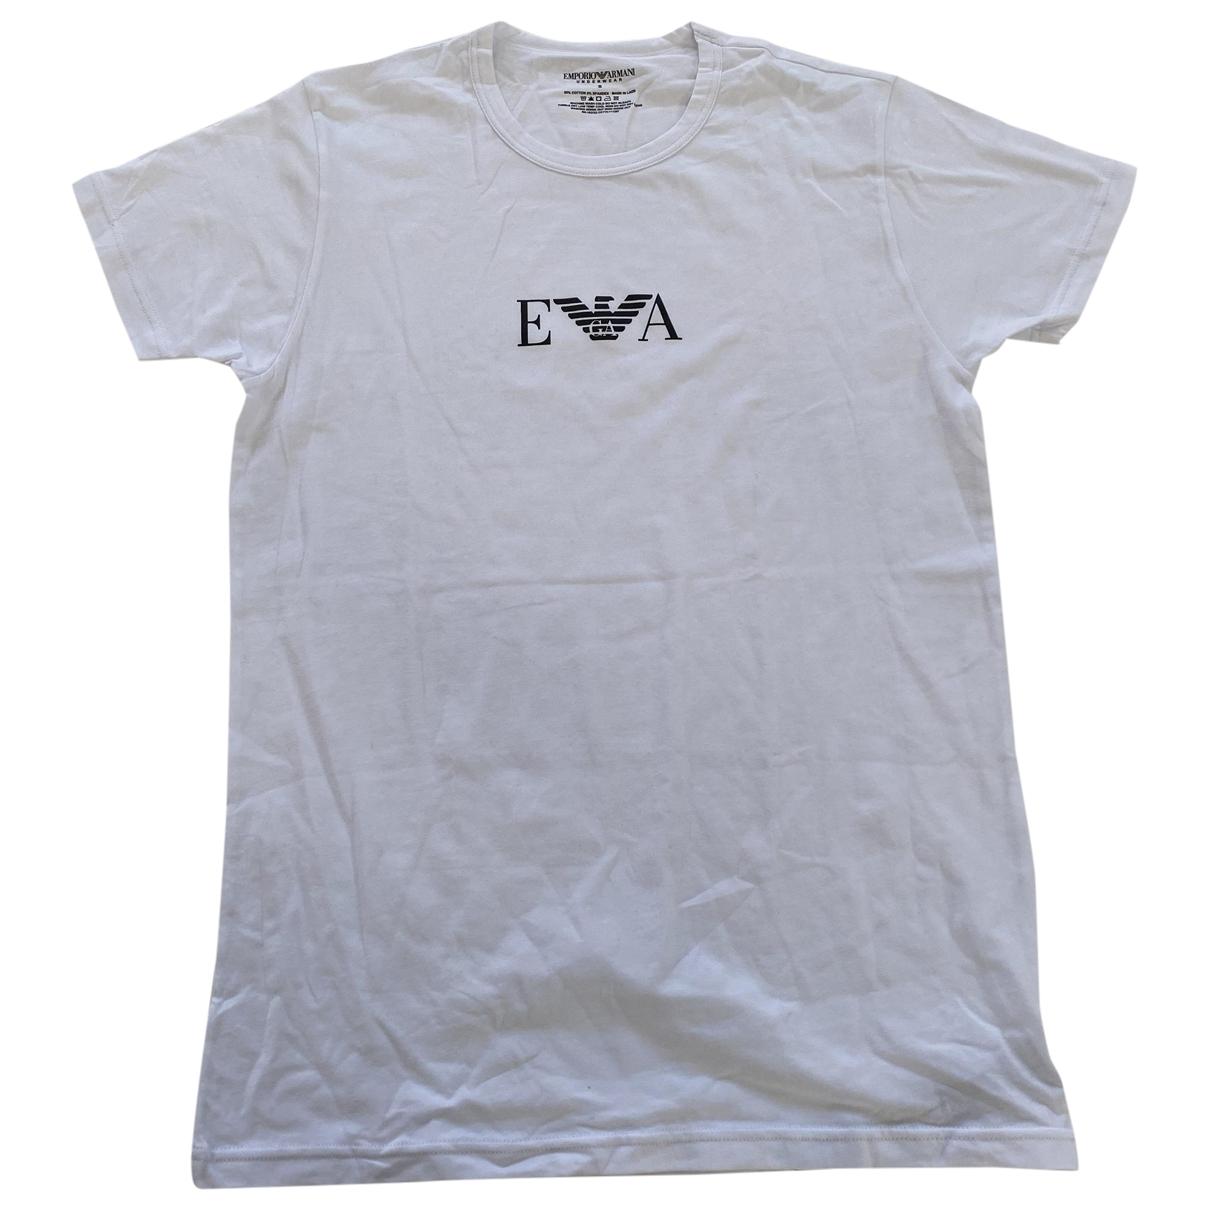 Emporio Armani \N T-Shirts in  Weiss Baumwolle